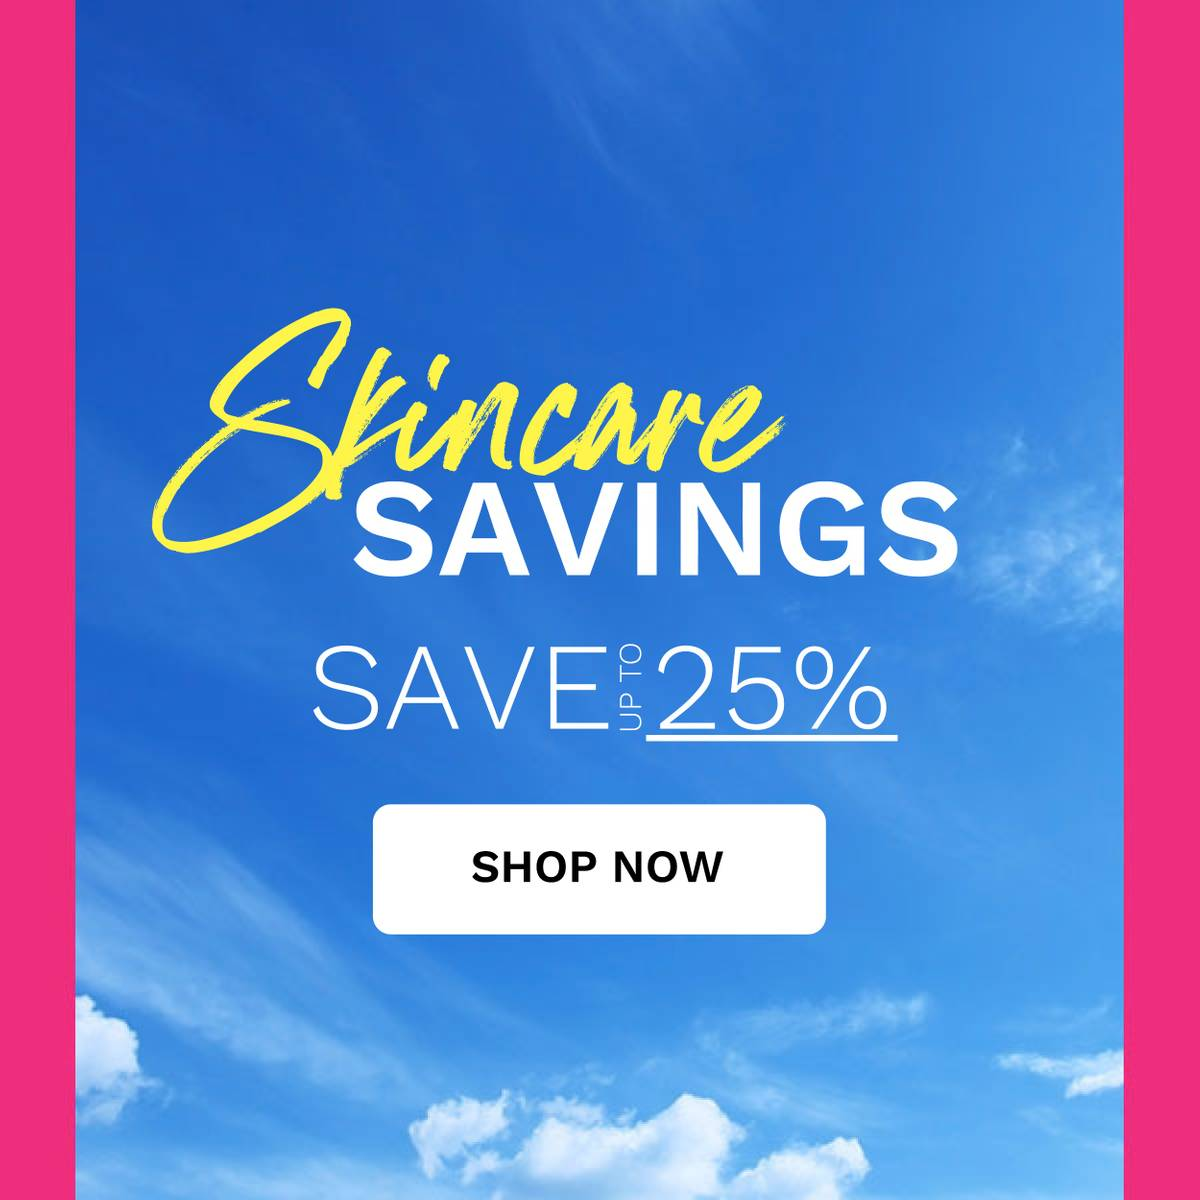 skincare savings banner